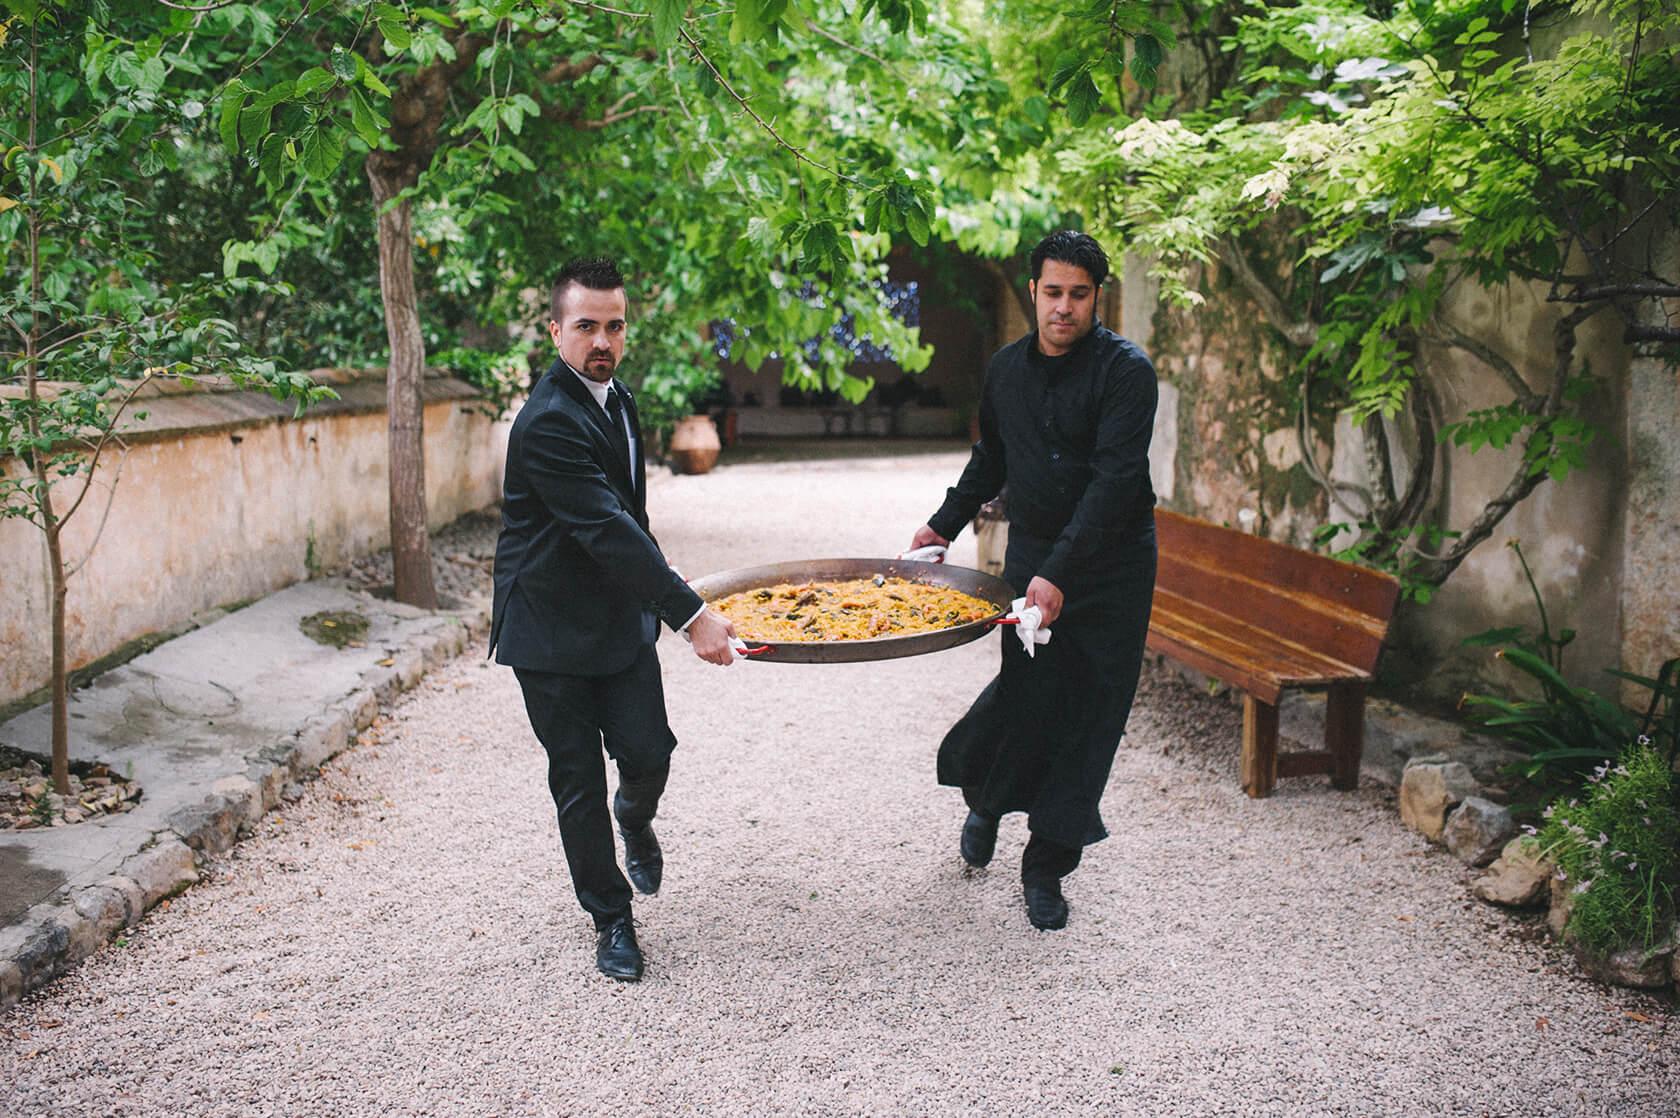 destination wedding photo shoot in villa catalina Sitges